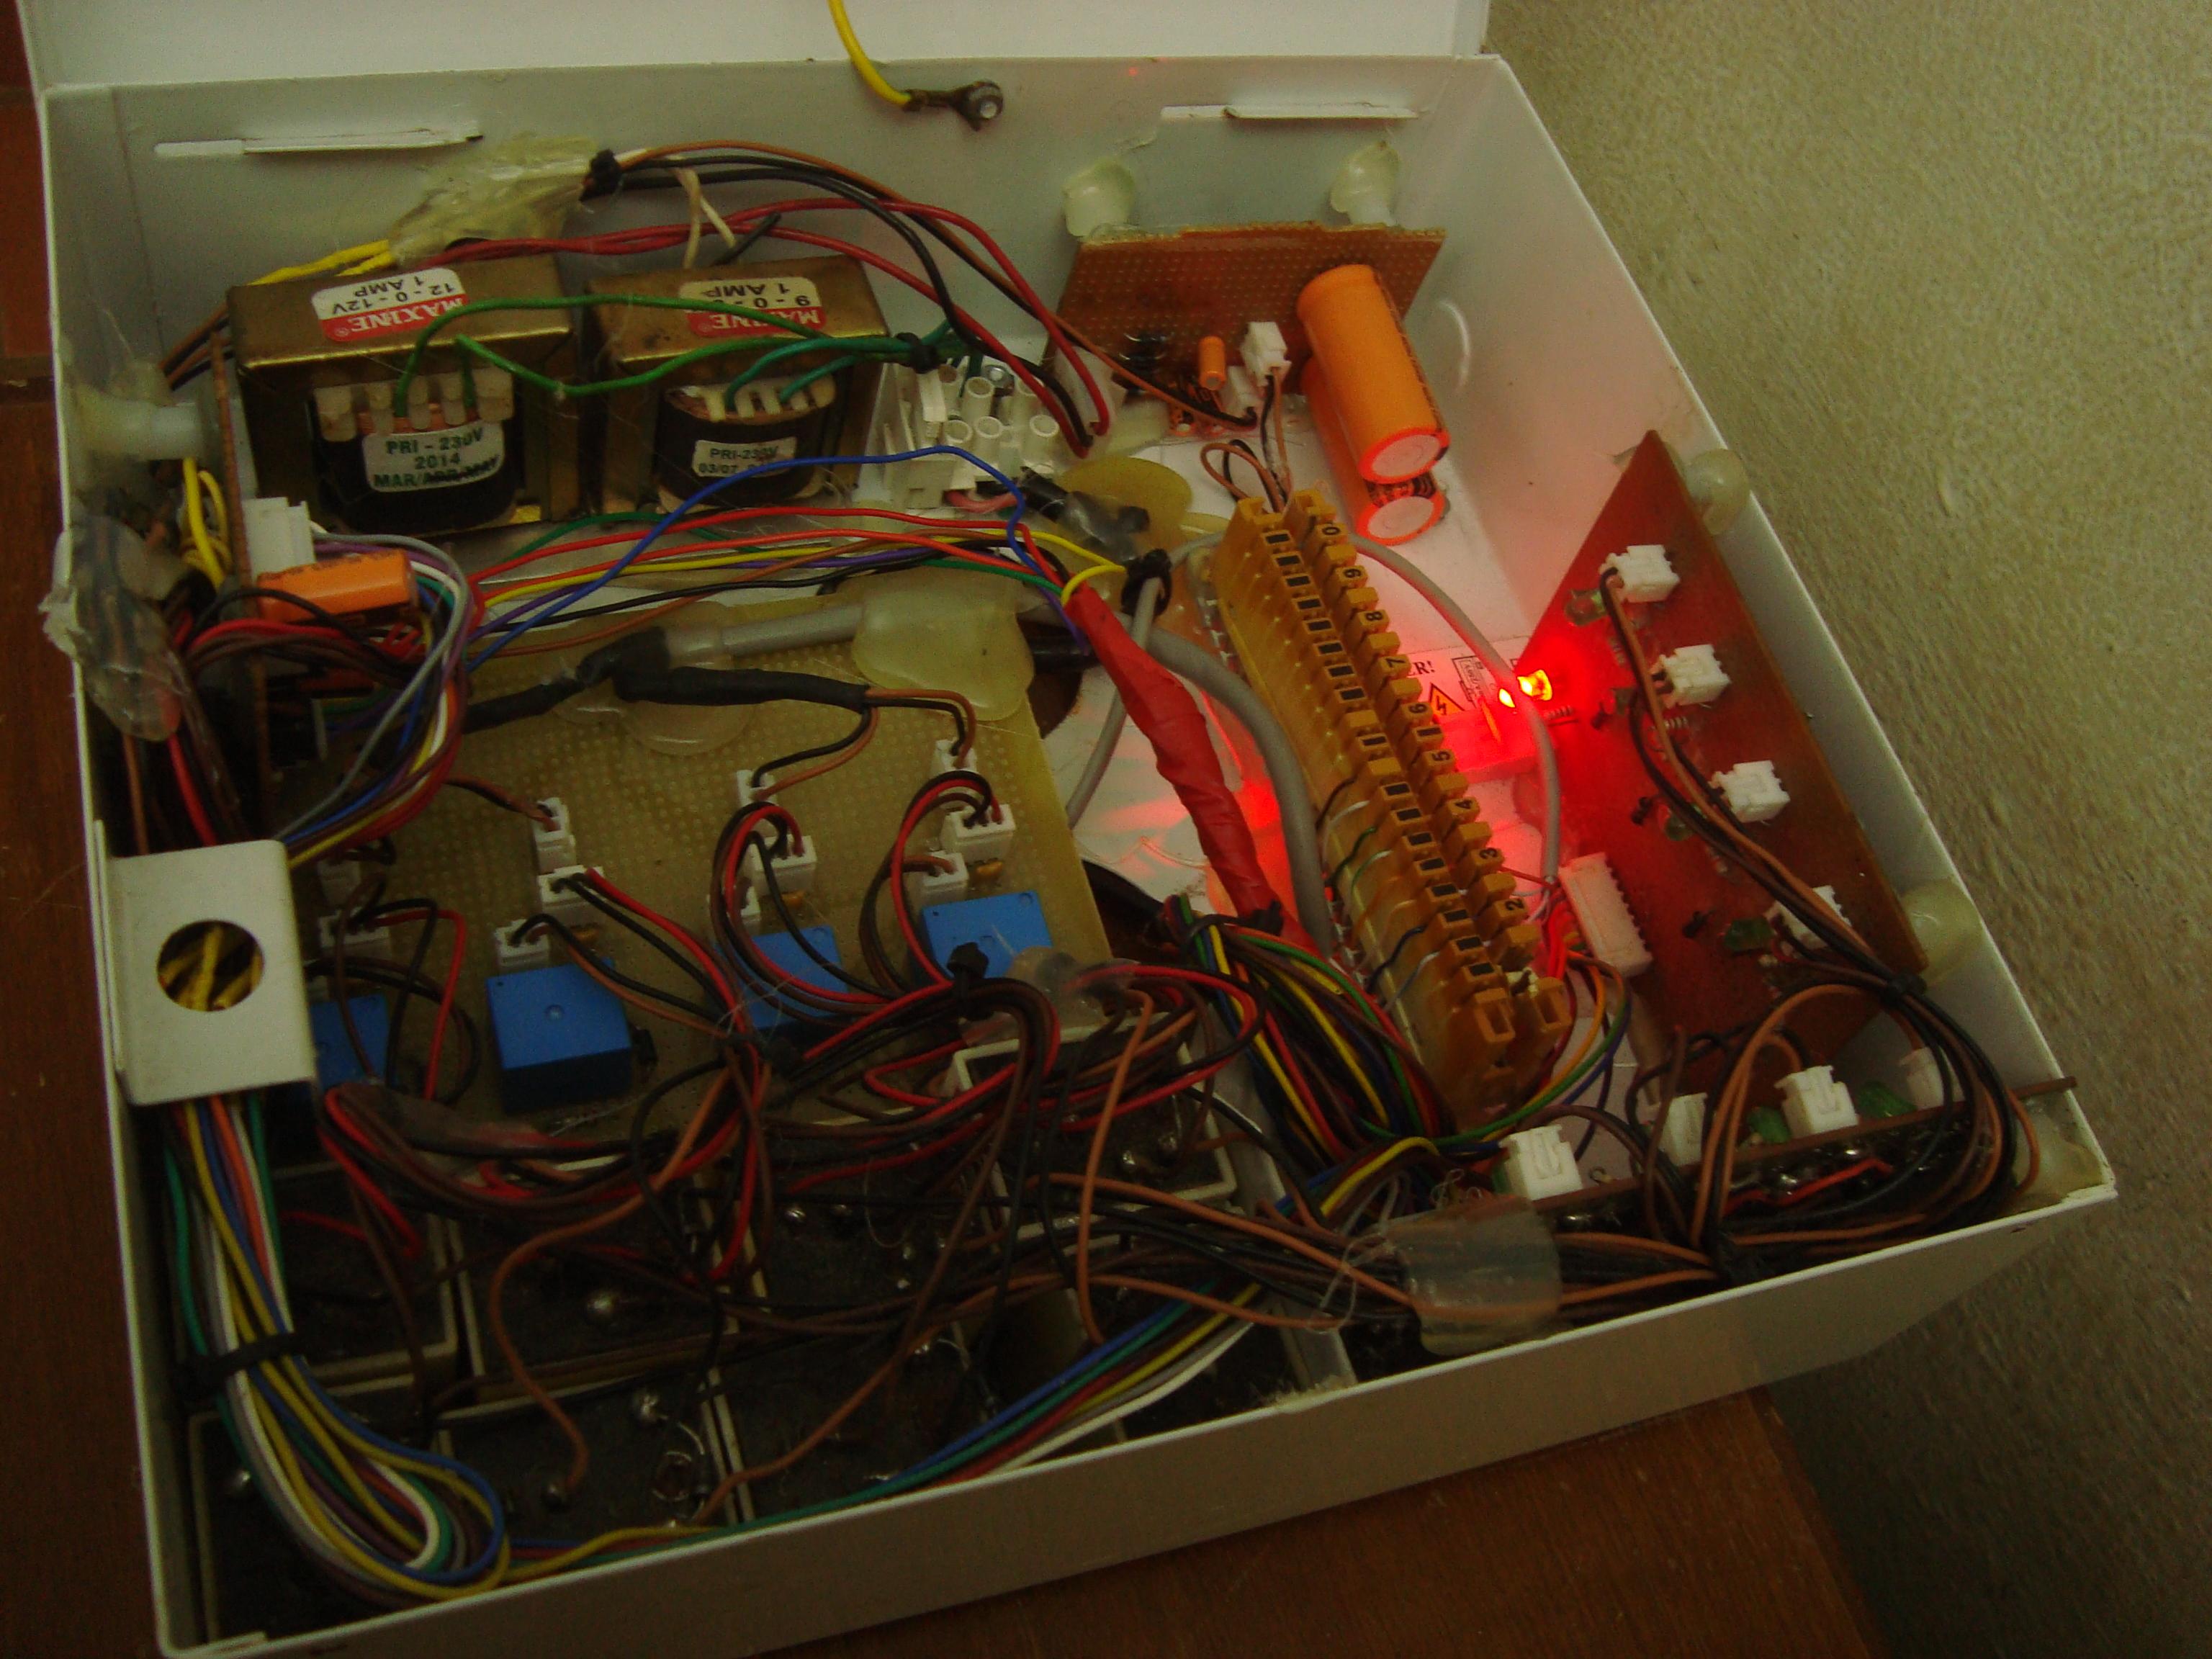 Picture of Homemade Intercom (PBX) With GPIO